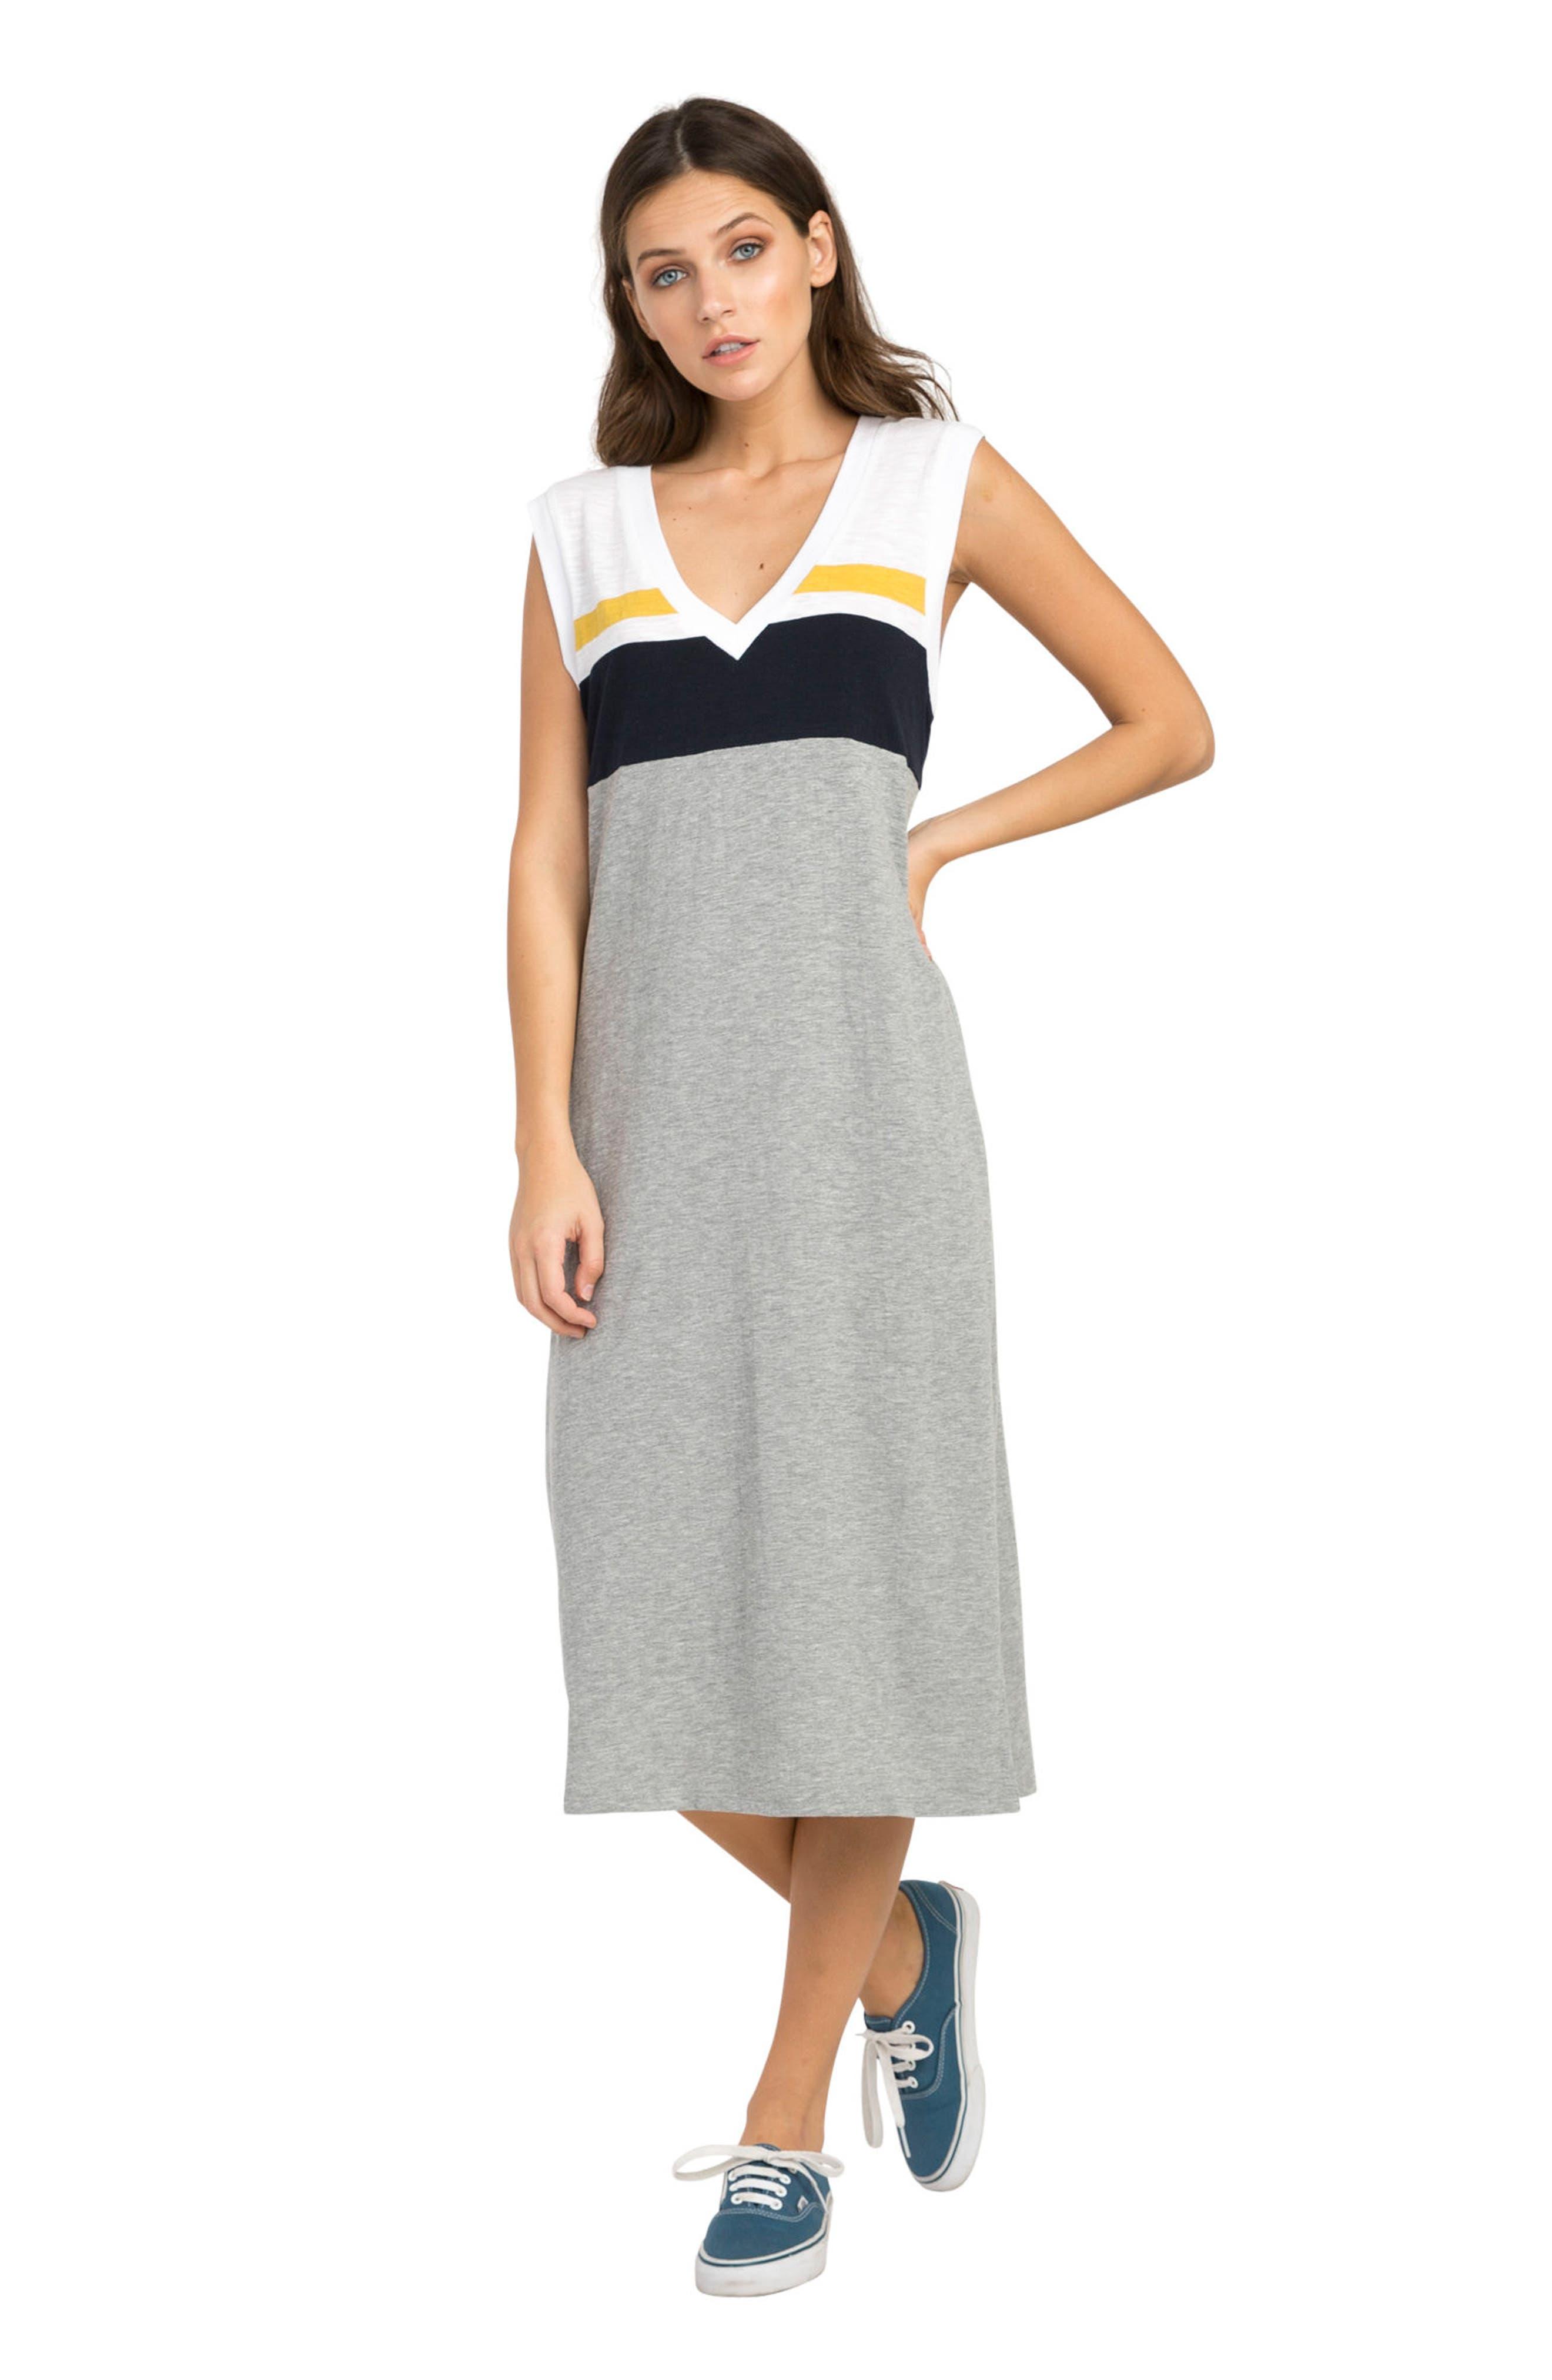 Scorekeeper Midi Dress,                             Alternate thumbnail 2, color,                             Heather Grey